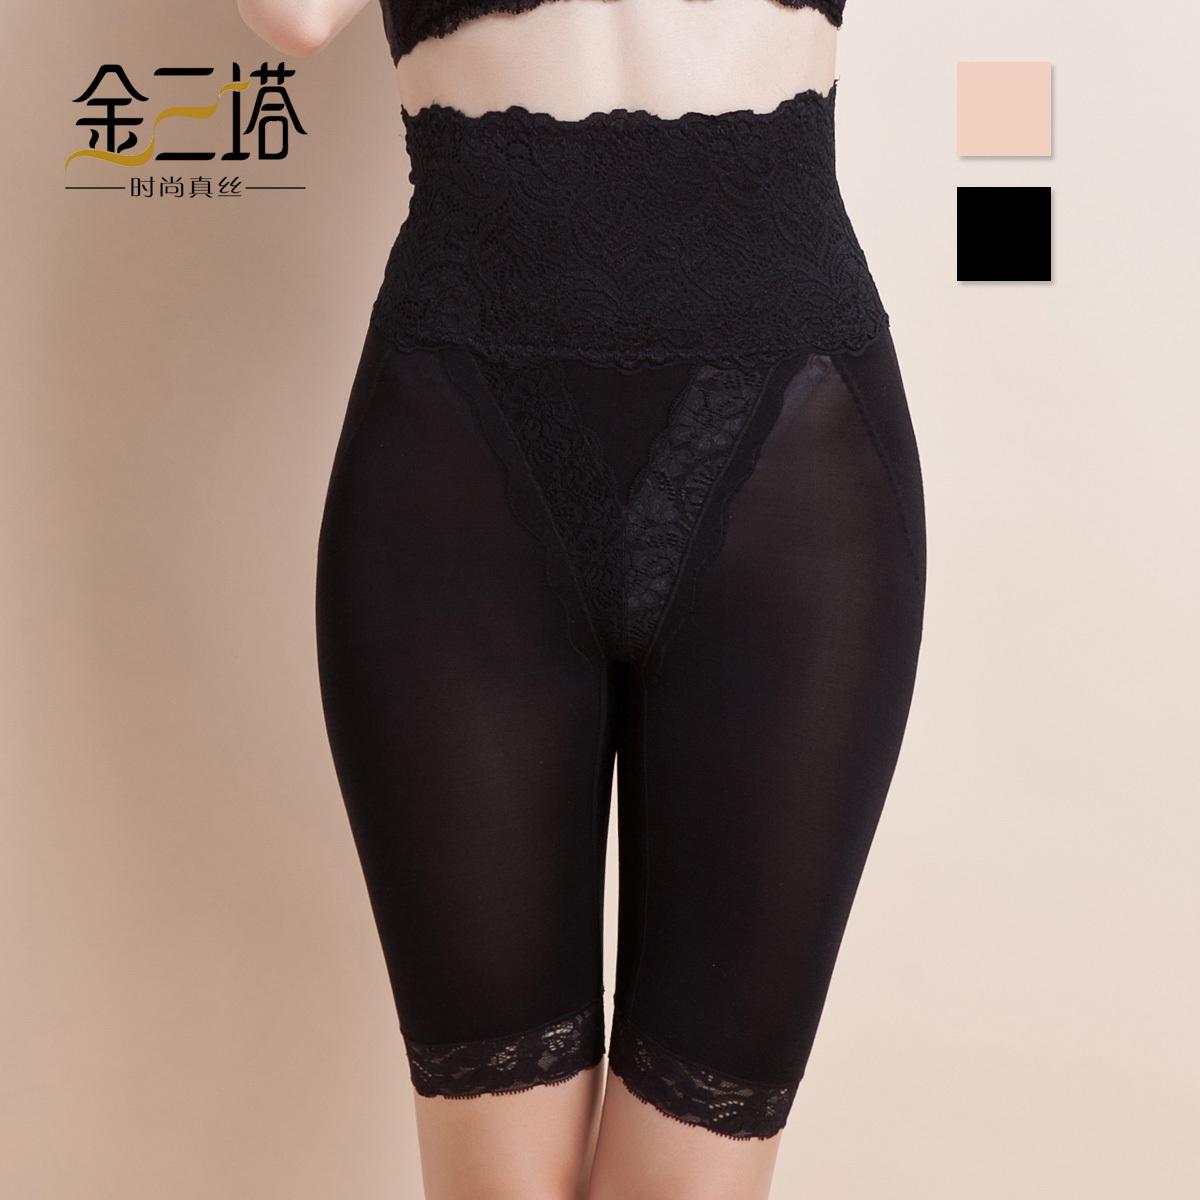 Silk spandex butt-lifting slim waist body shaping high waist panties knee-length pants abdomen drawing corset pants